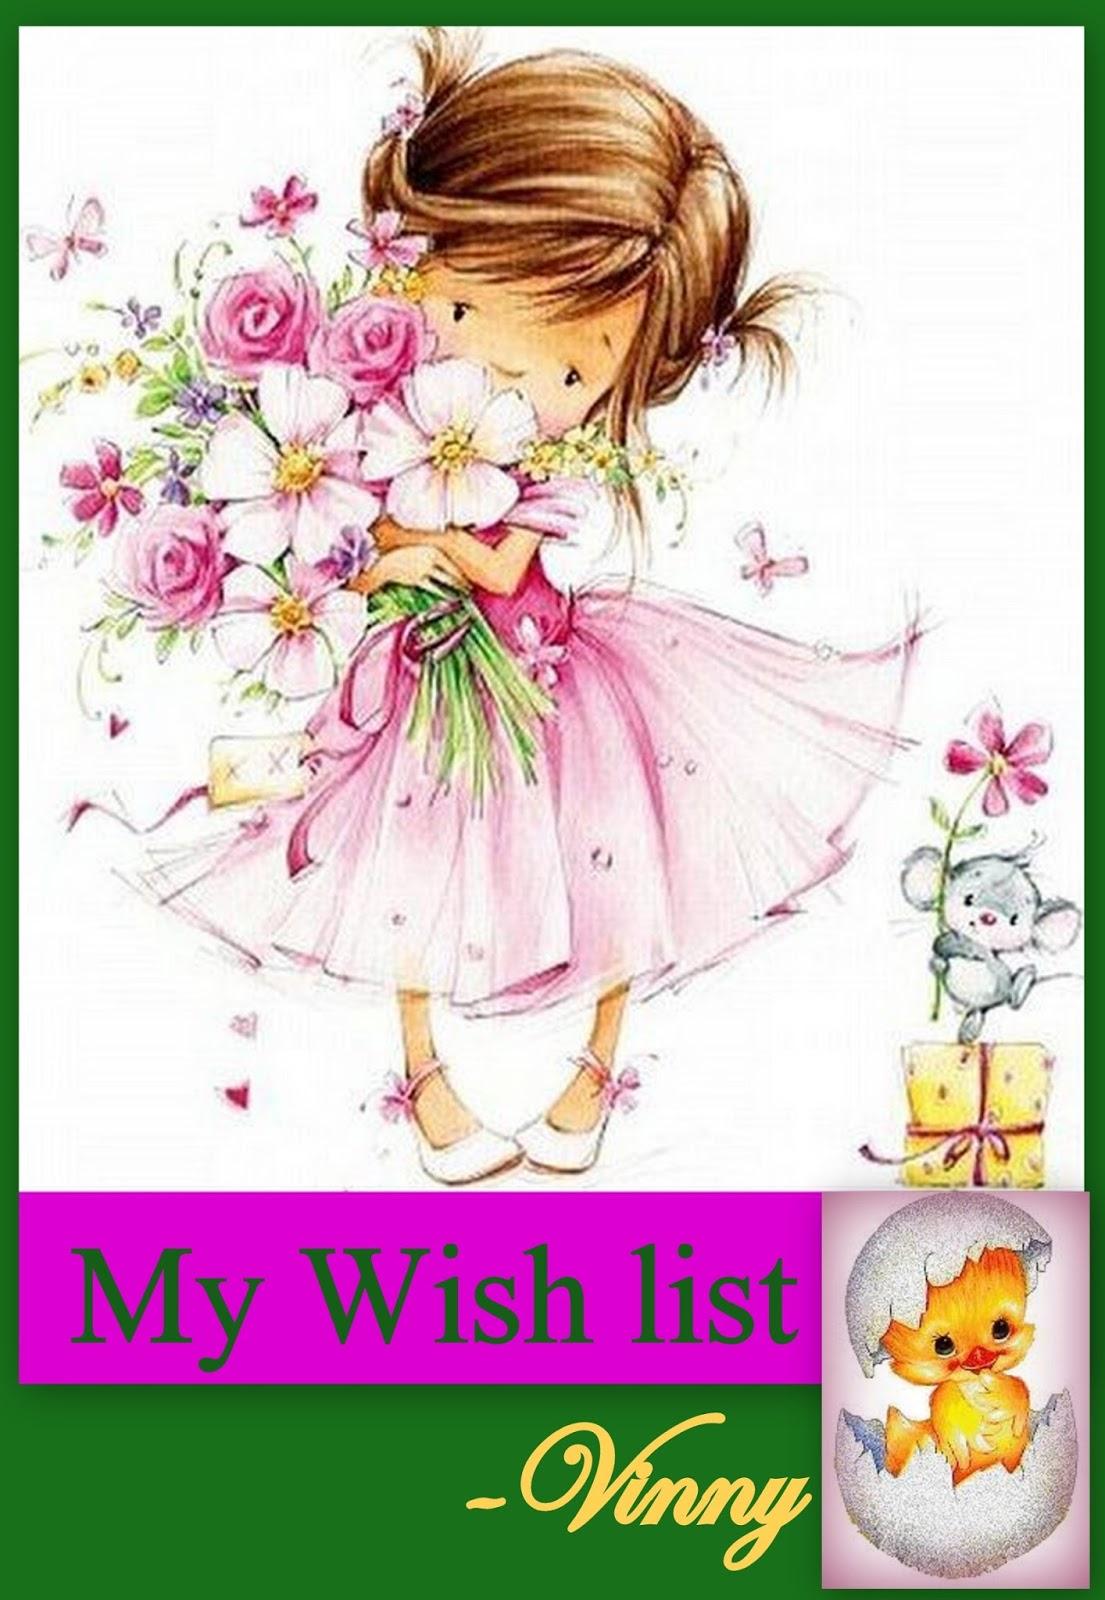 My wish list :):)